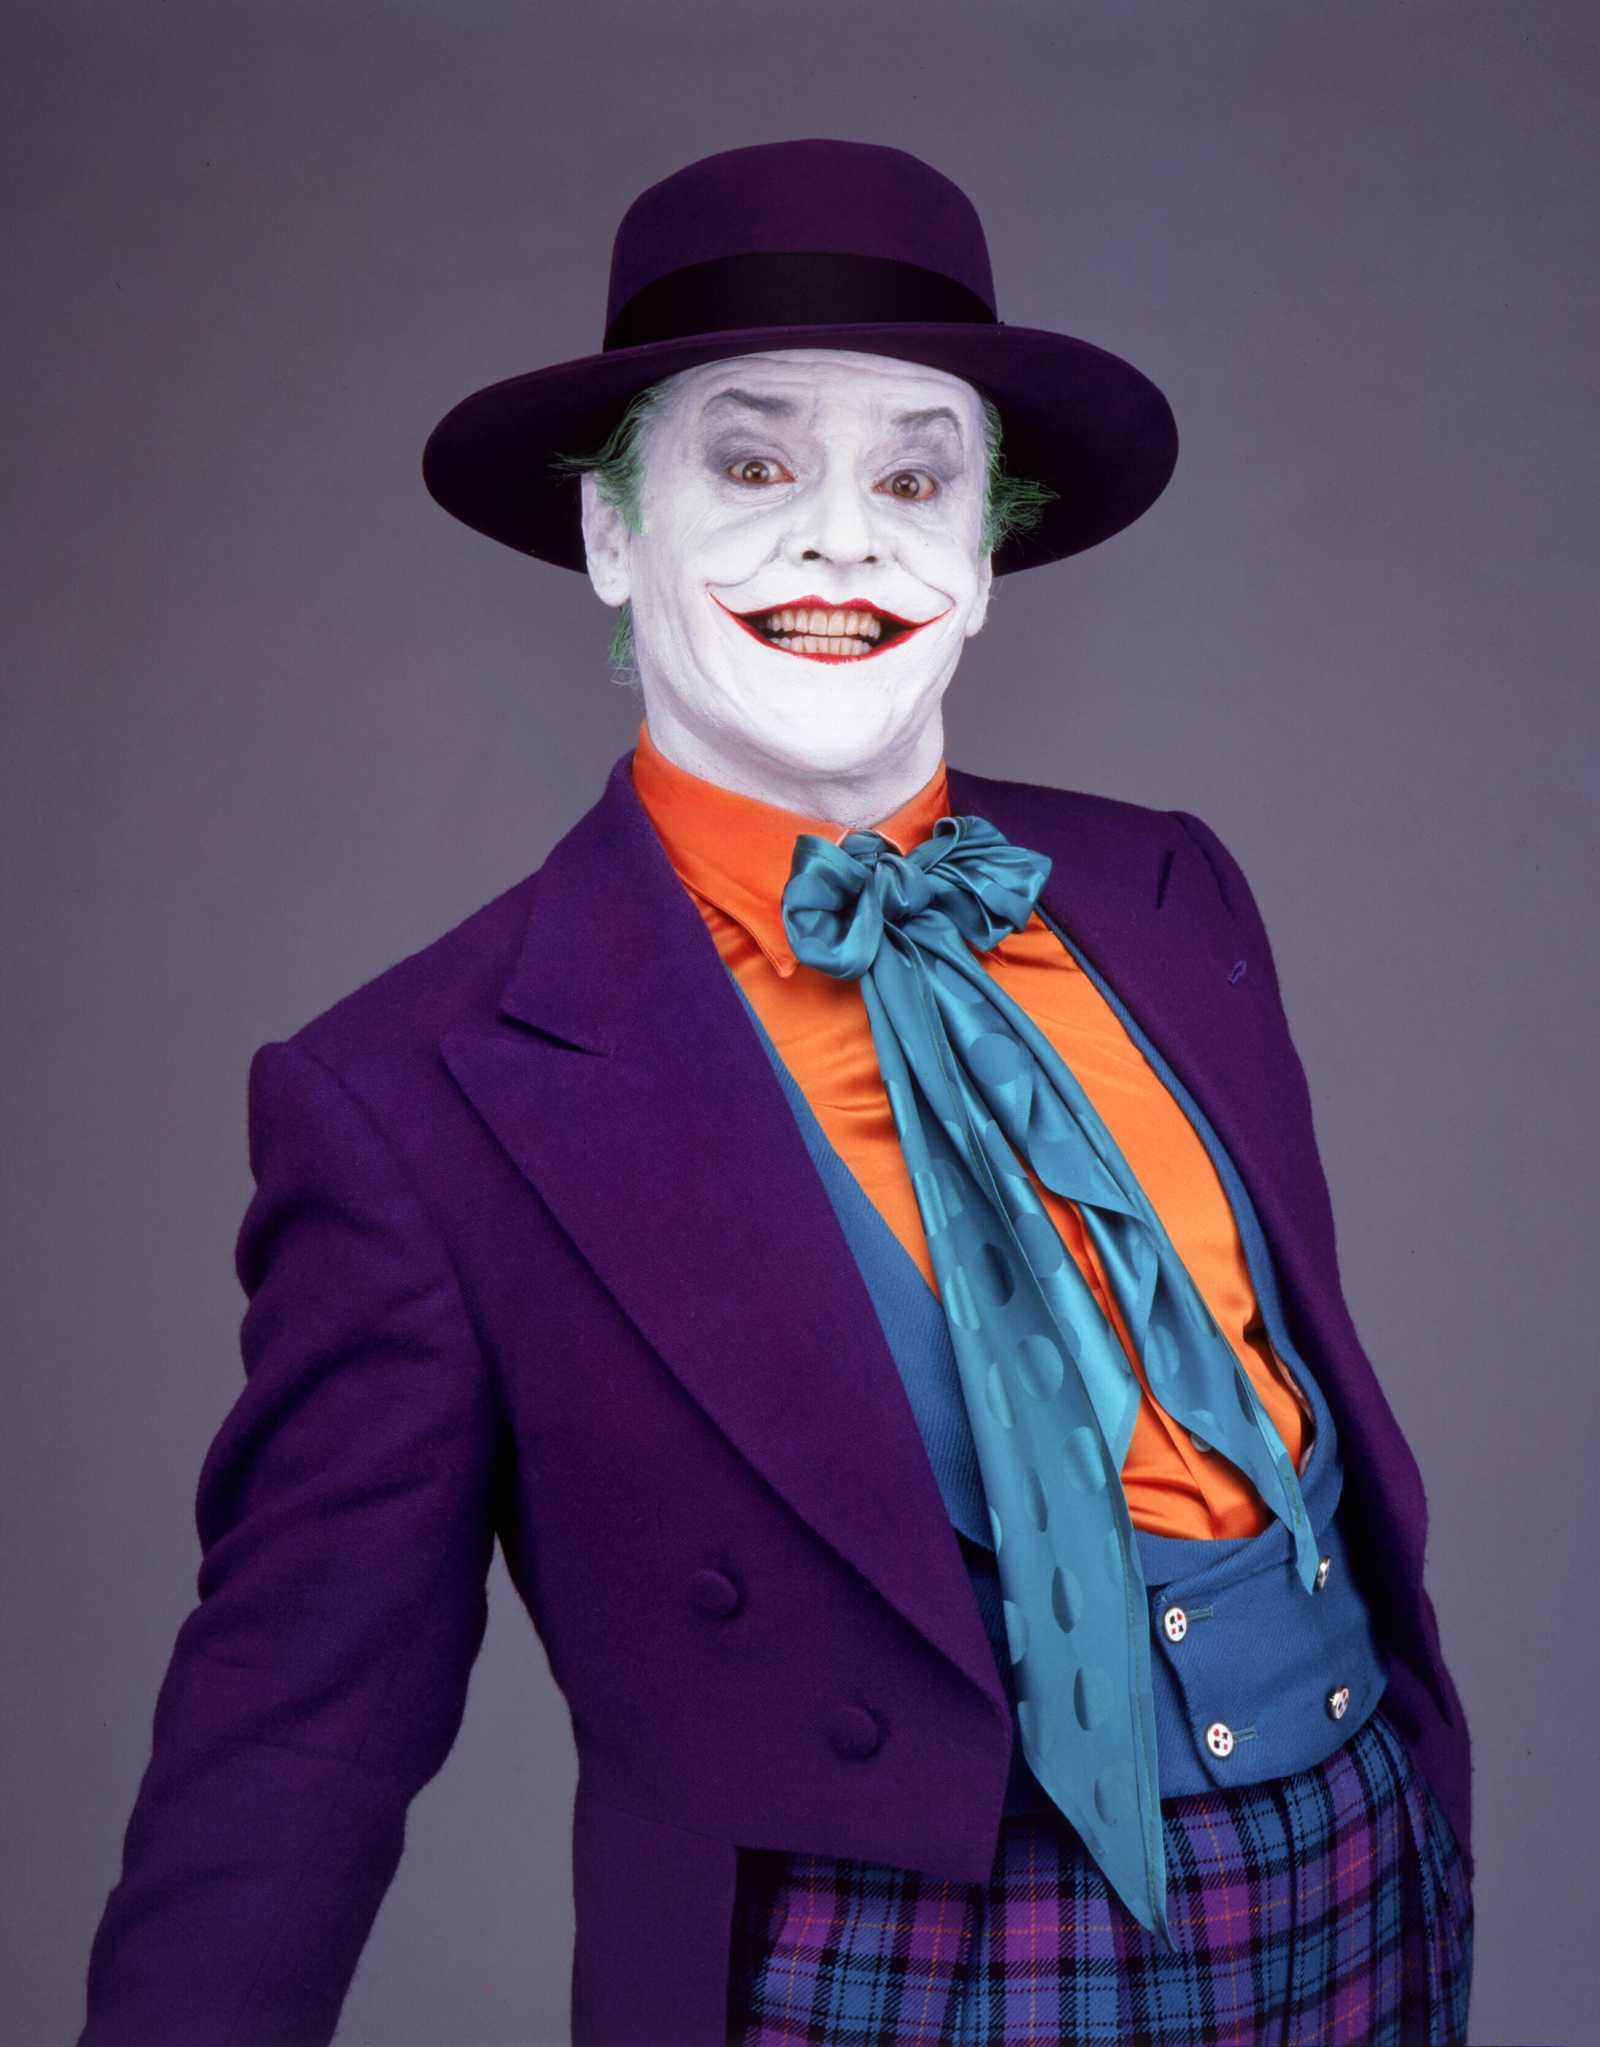 the joker in batman - photo #20